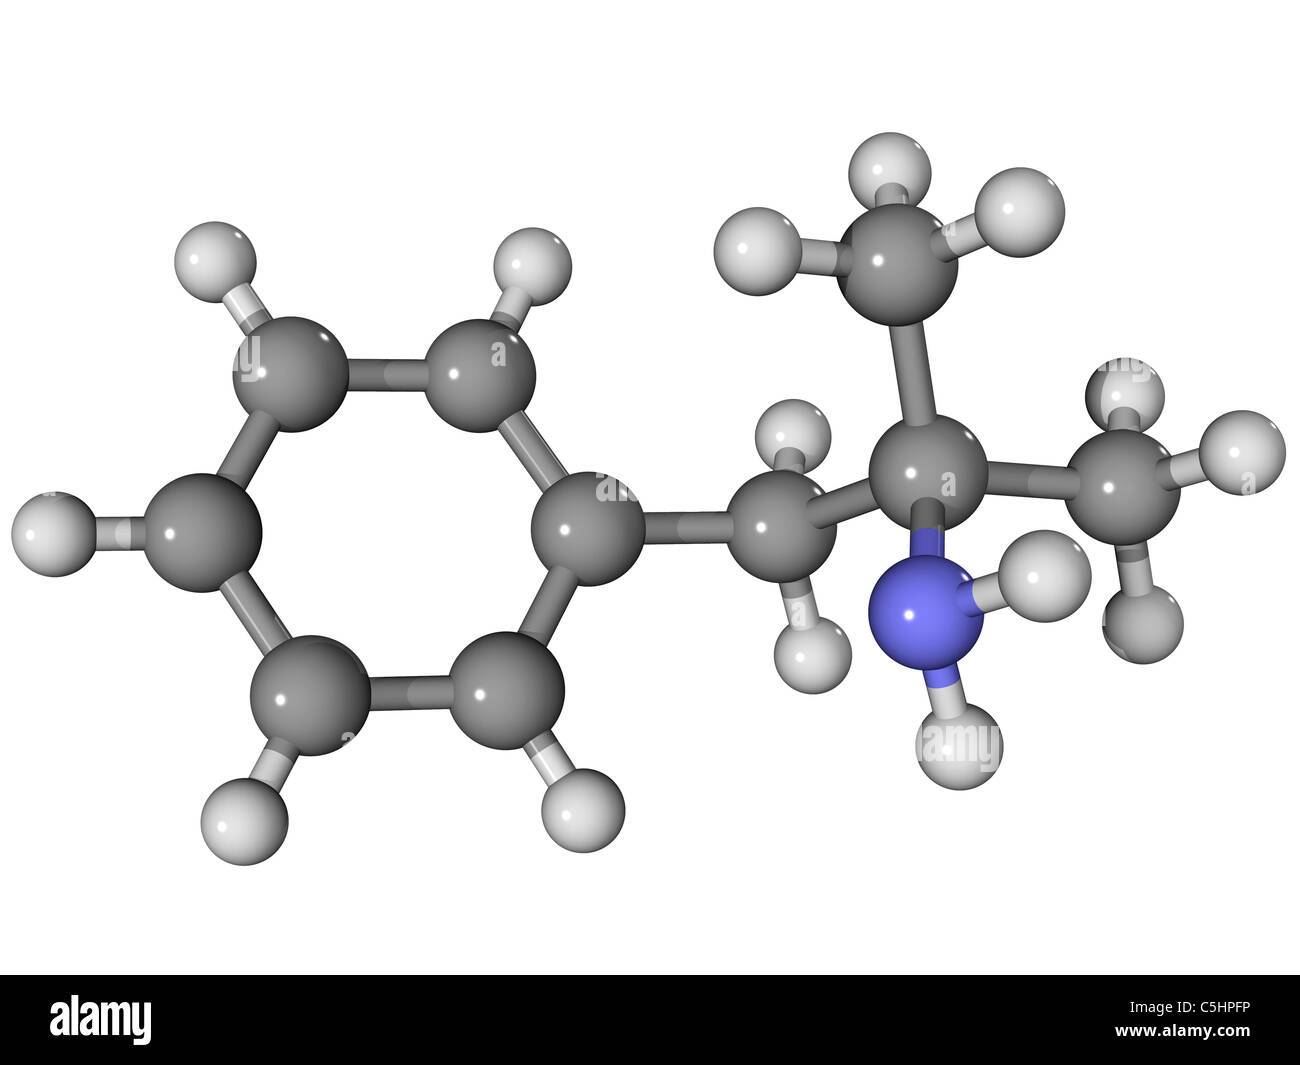 Phentermine appetite suppressant molecule - Stock Image